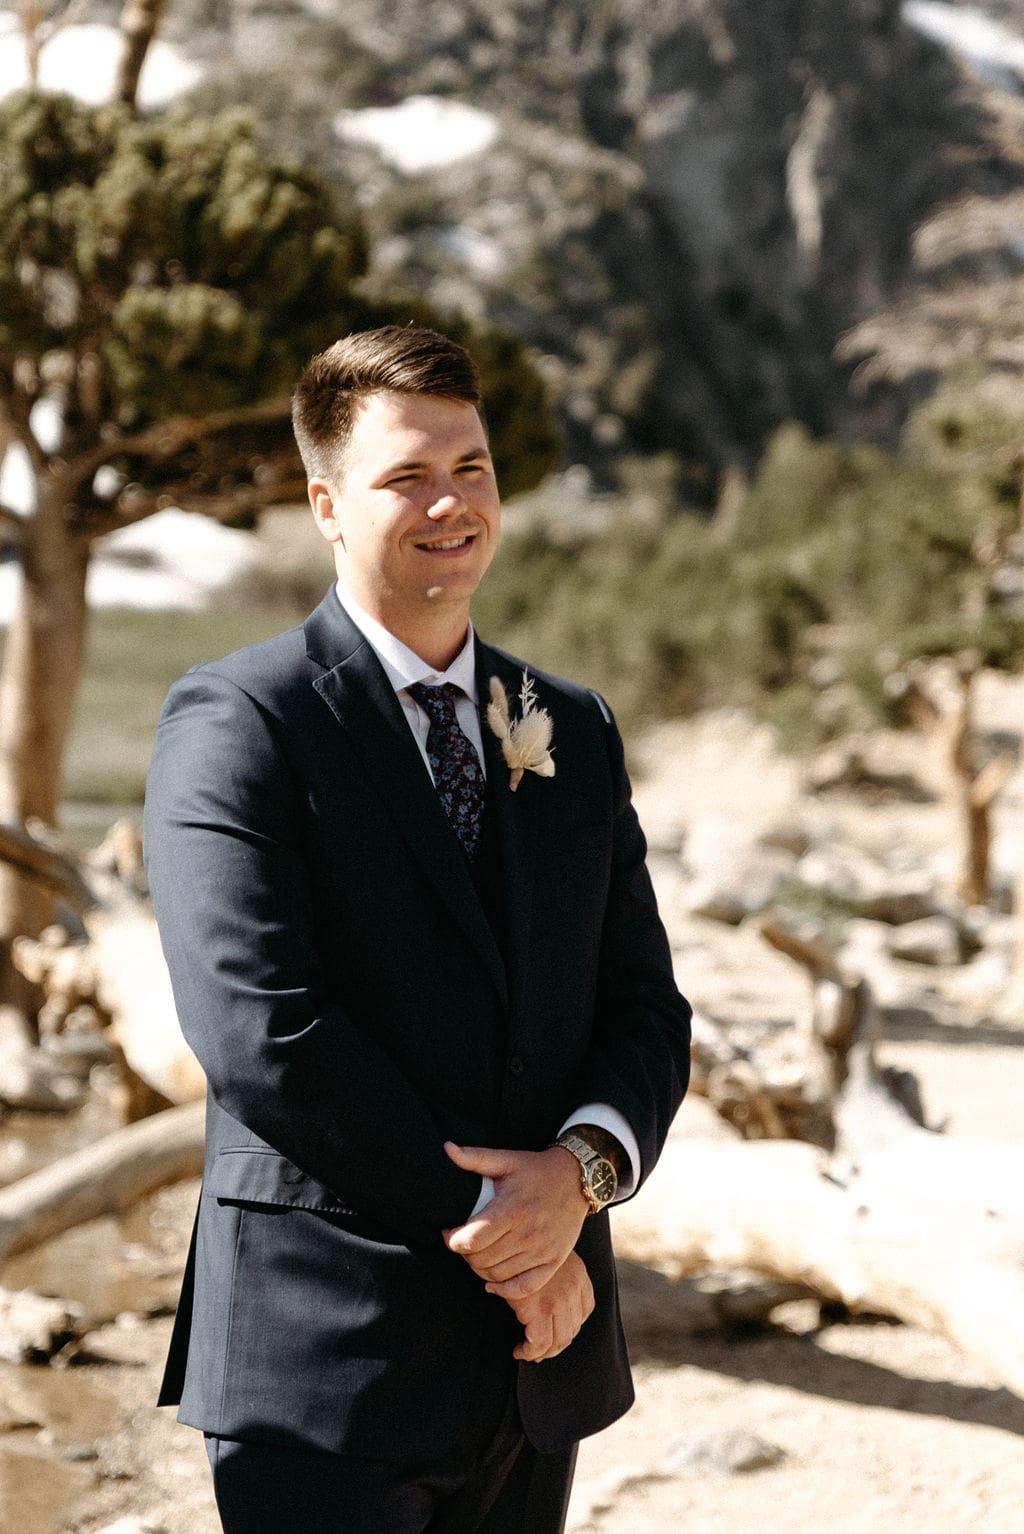 Groom waits for bride at St Mary's Glacier elopement in Idaho Springs Colorado